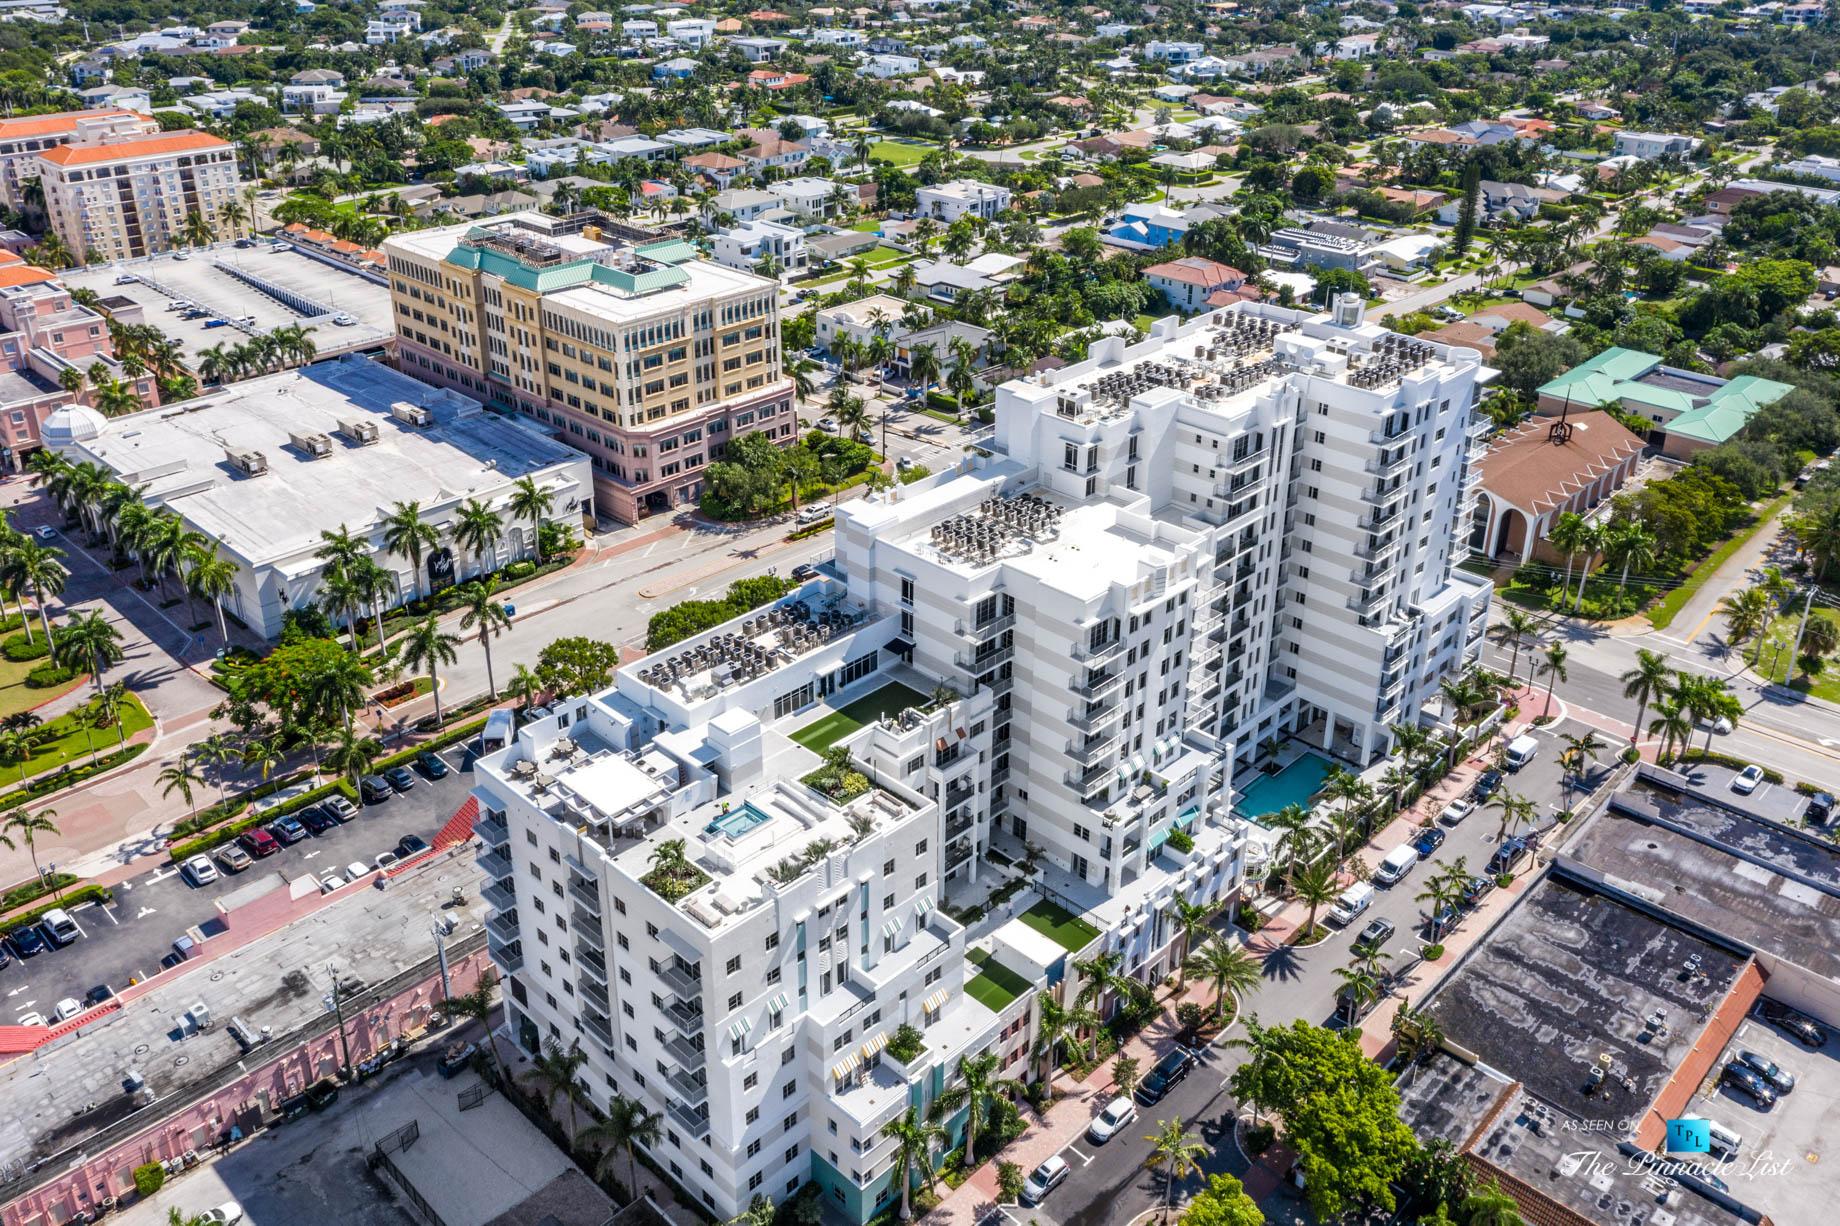 155 E Boca Raton Rd, Unit 416, Boca Raton, FL, USA